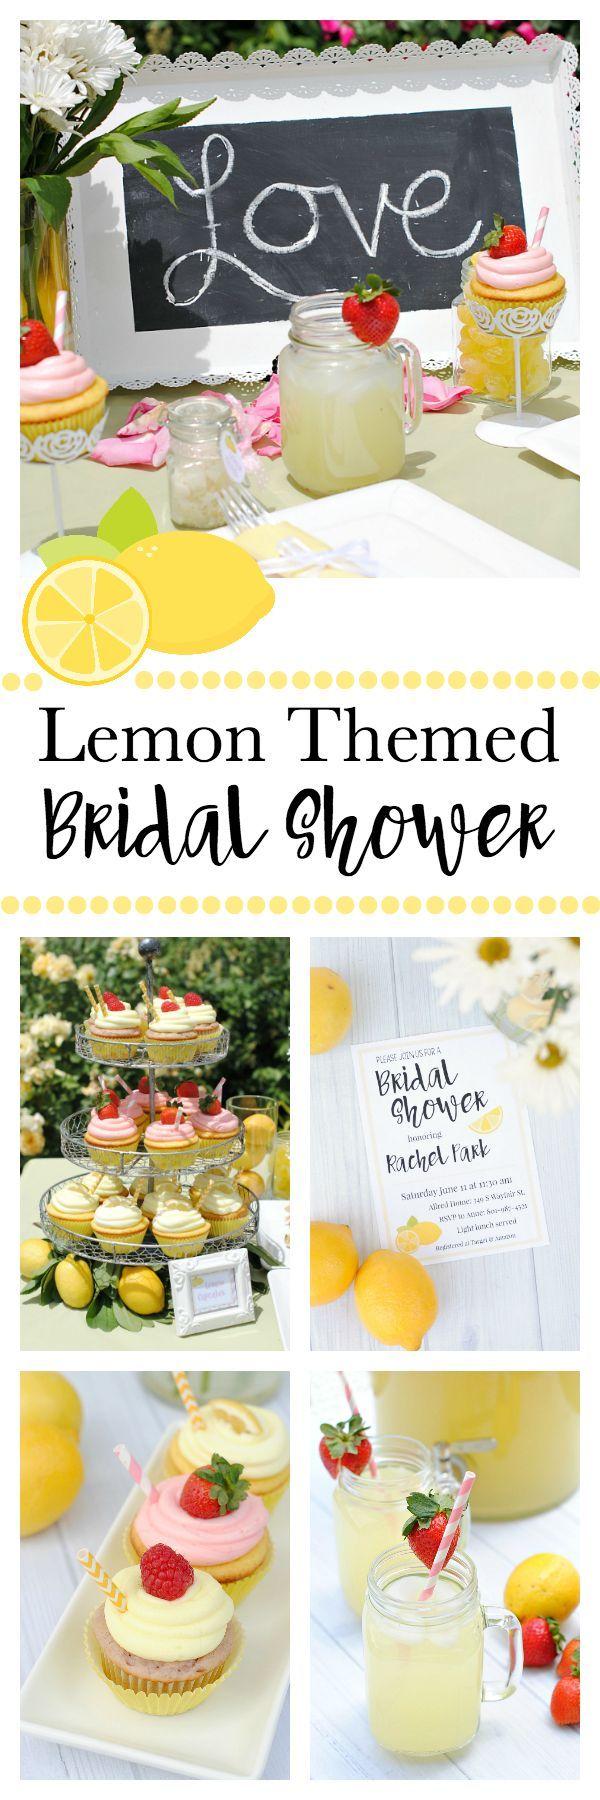 137 best bridal shower ideas images on pinterest wedding